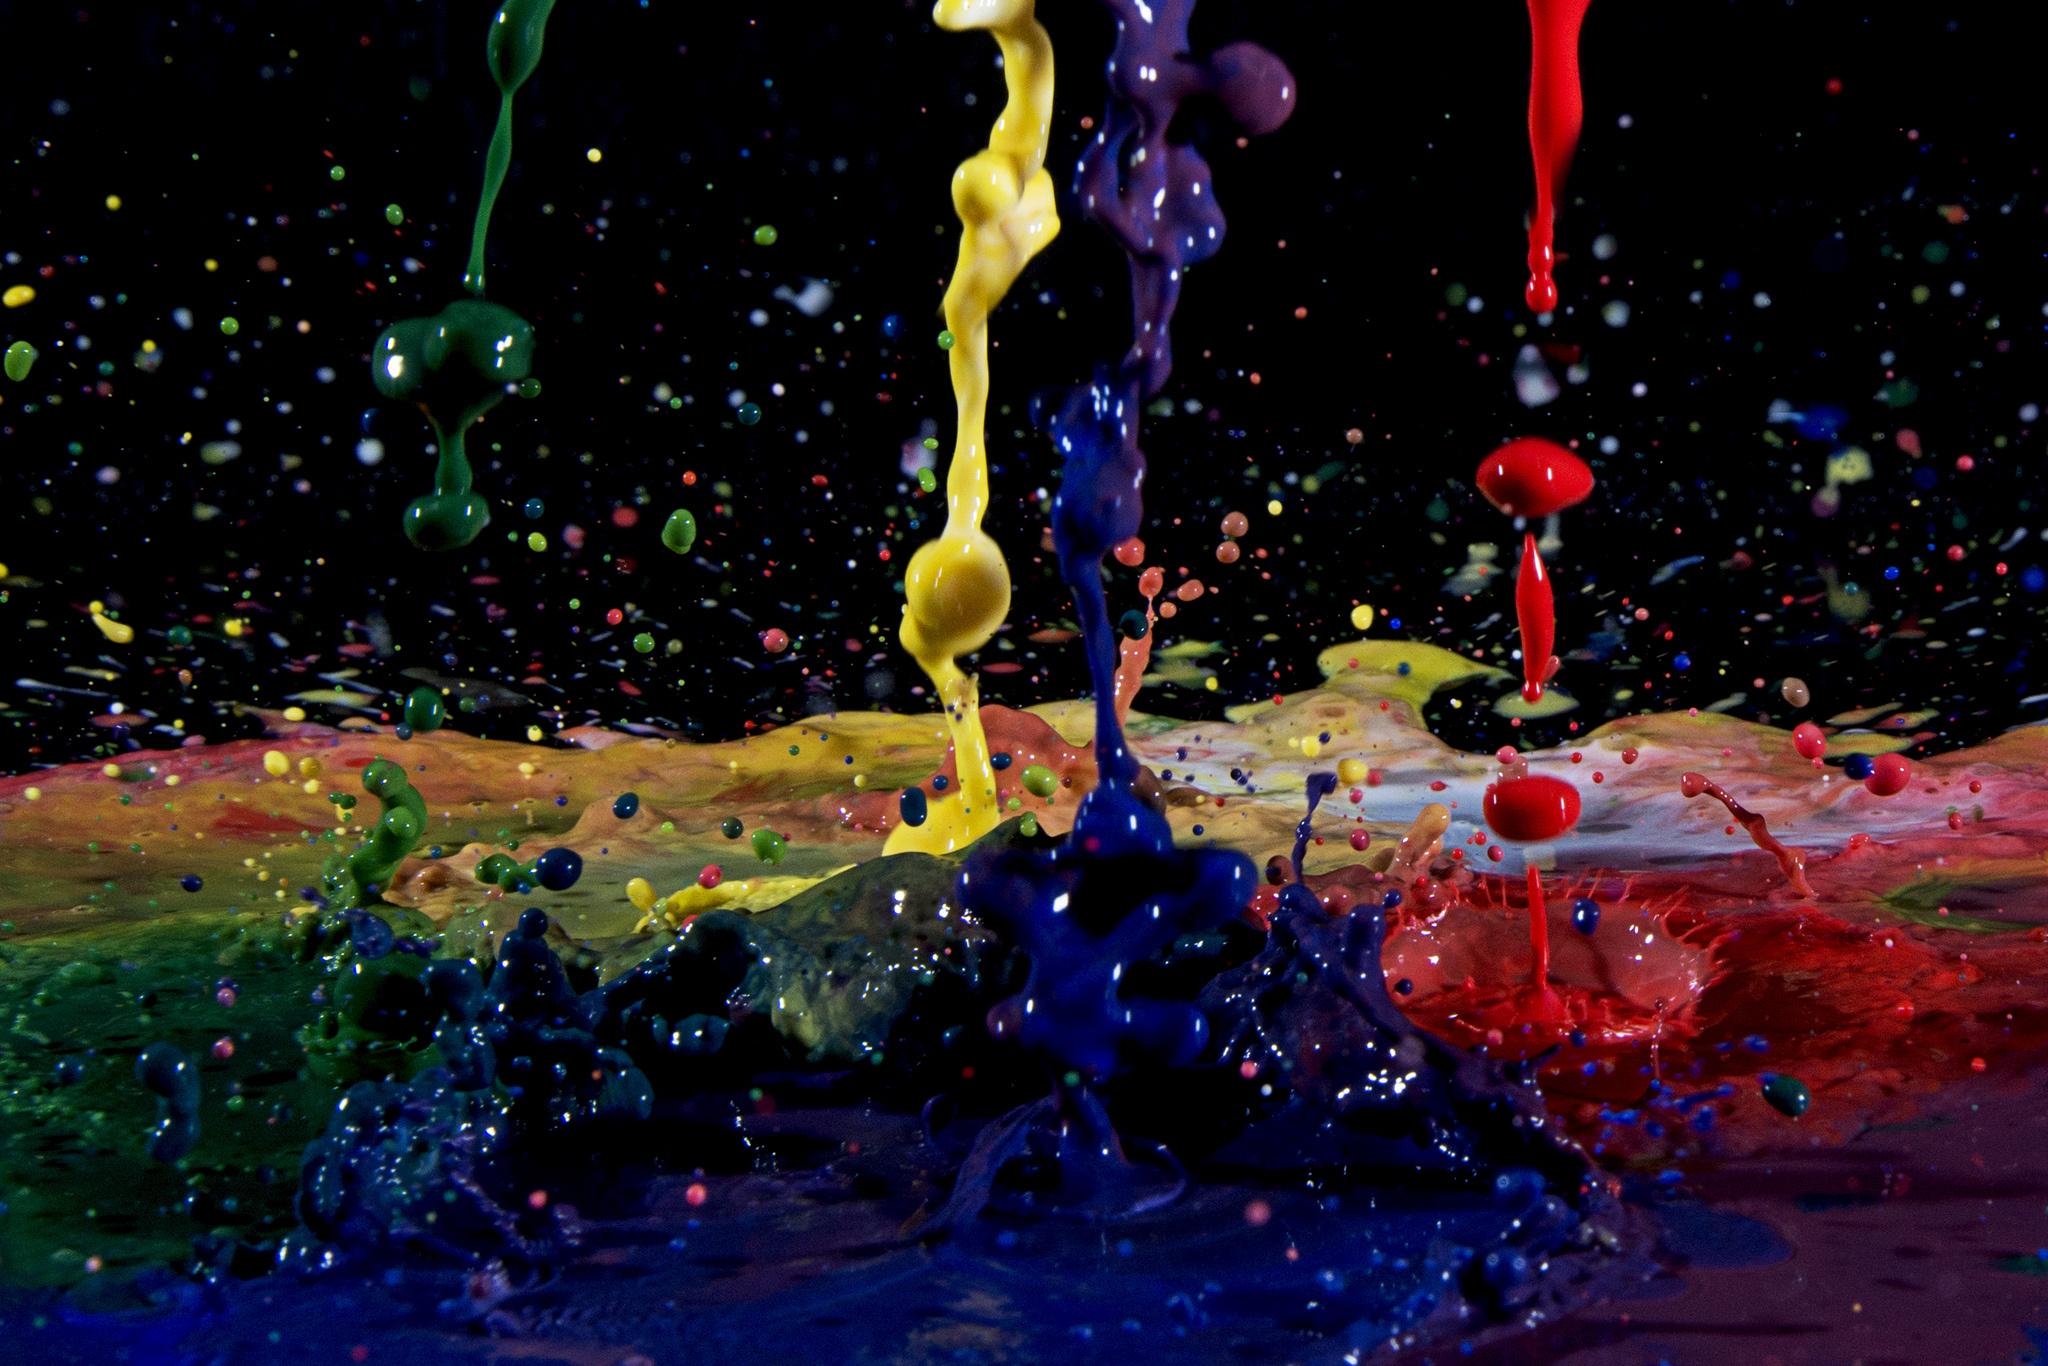 paint drop wallpaper - photo #2